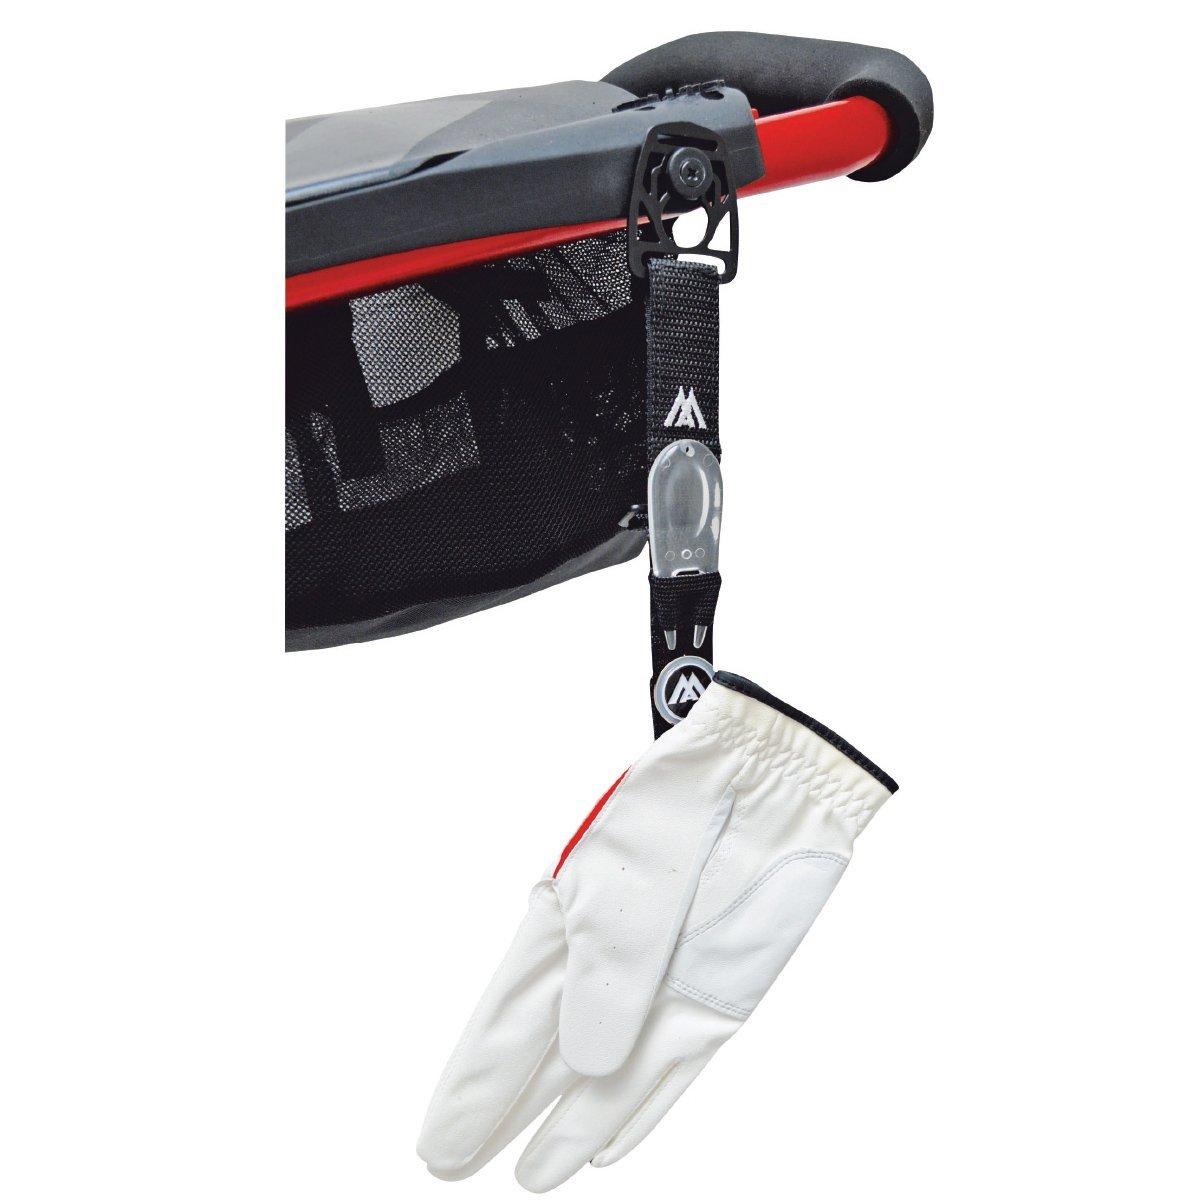 Big Max Golf Accessory Glove Holders